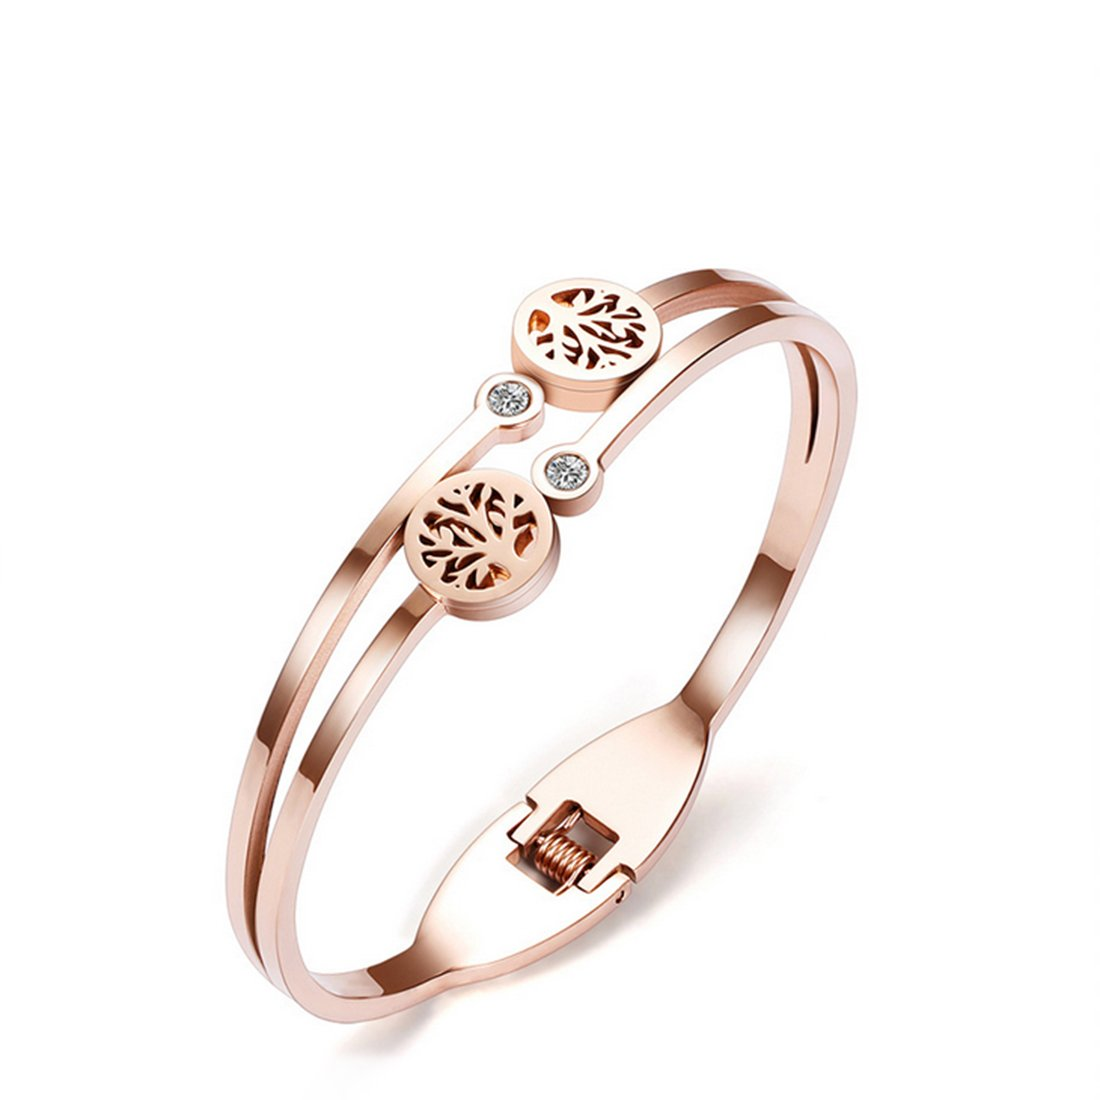 AZFEIYA Stainless Steel Bracelet for Women Rose Gold Plated Oval Cuff Tree of Life Open Adjustable Bangle (Rose Gold bracelet)